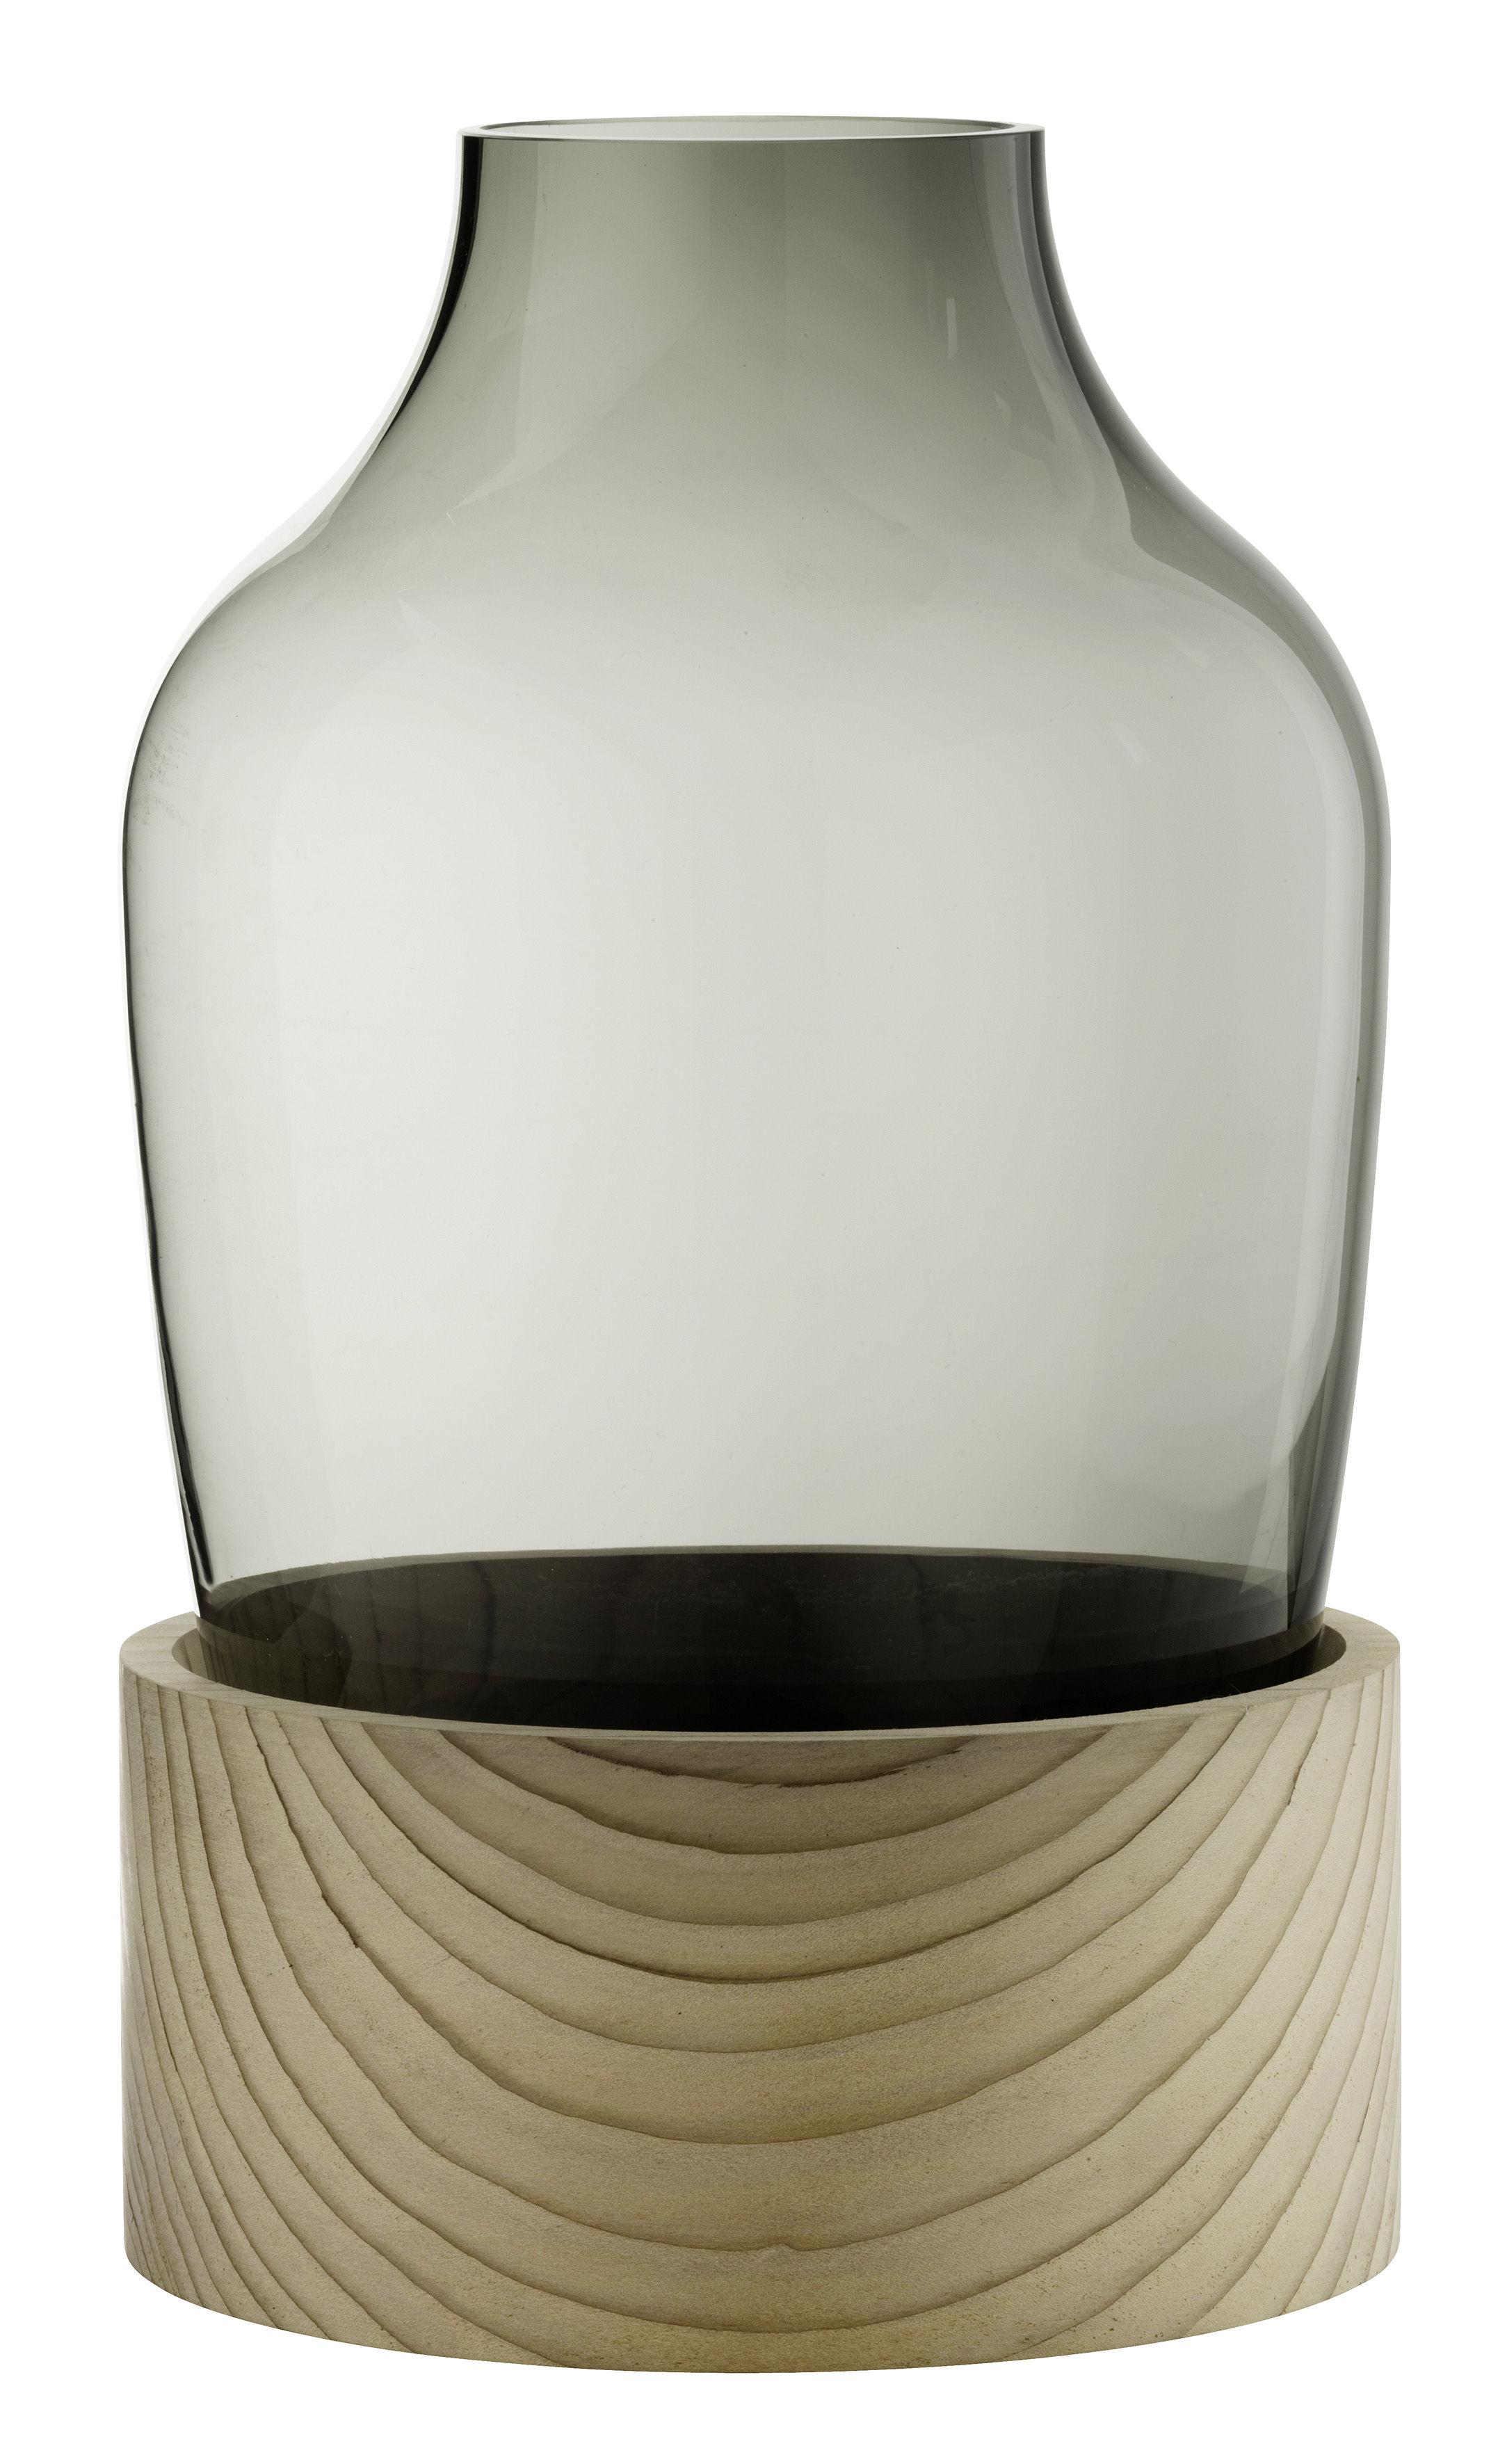 vase verre souffl bouche c dre h 30 cm verre fum. Black Bedroom Furniture Sets. Home Design Ideas